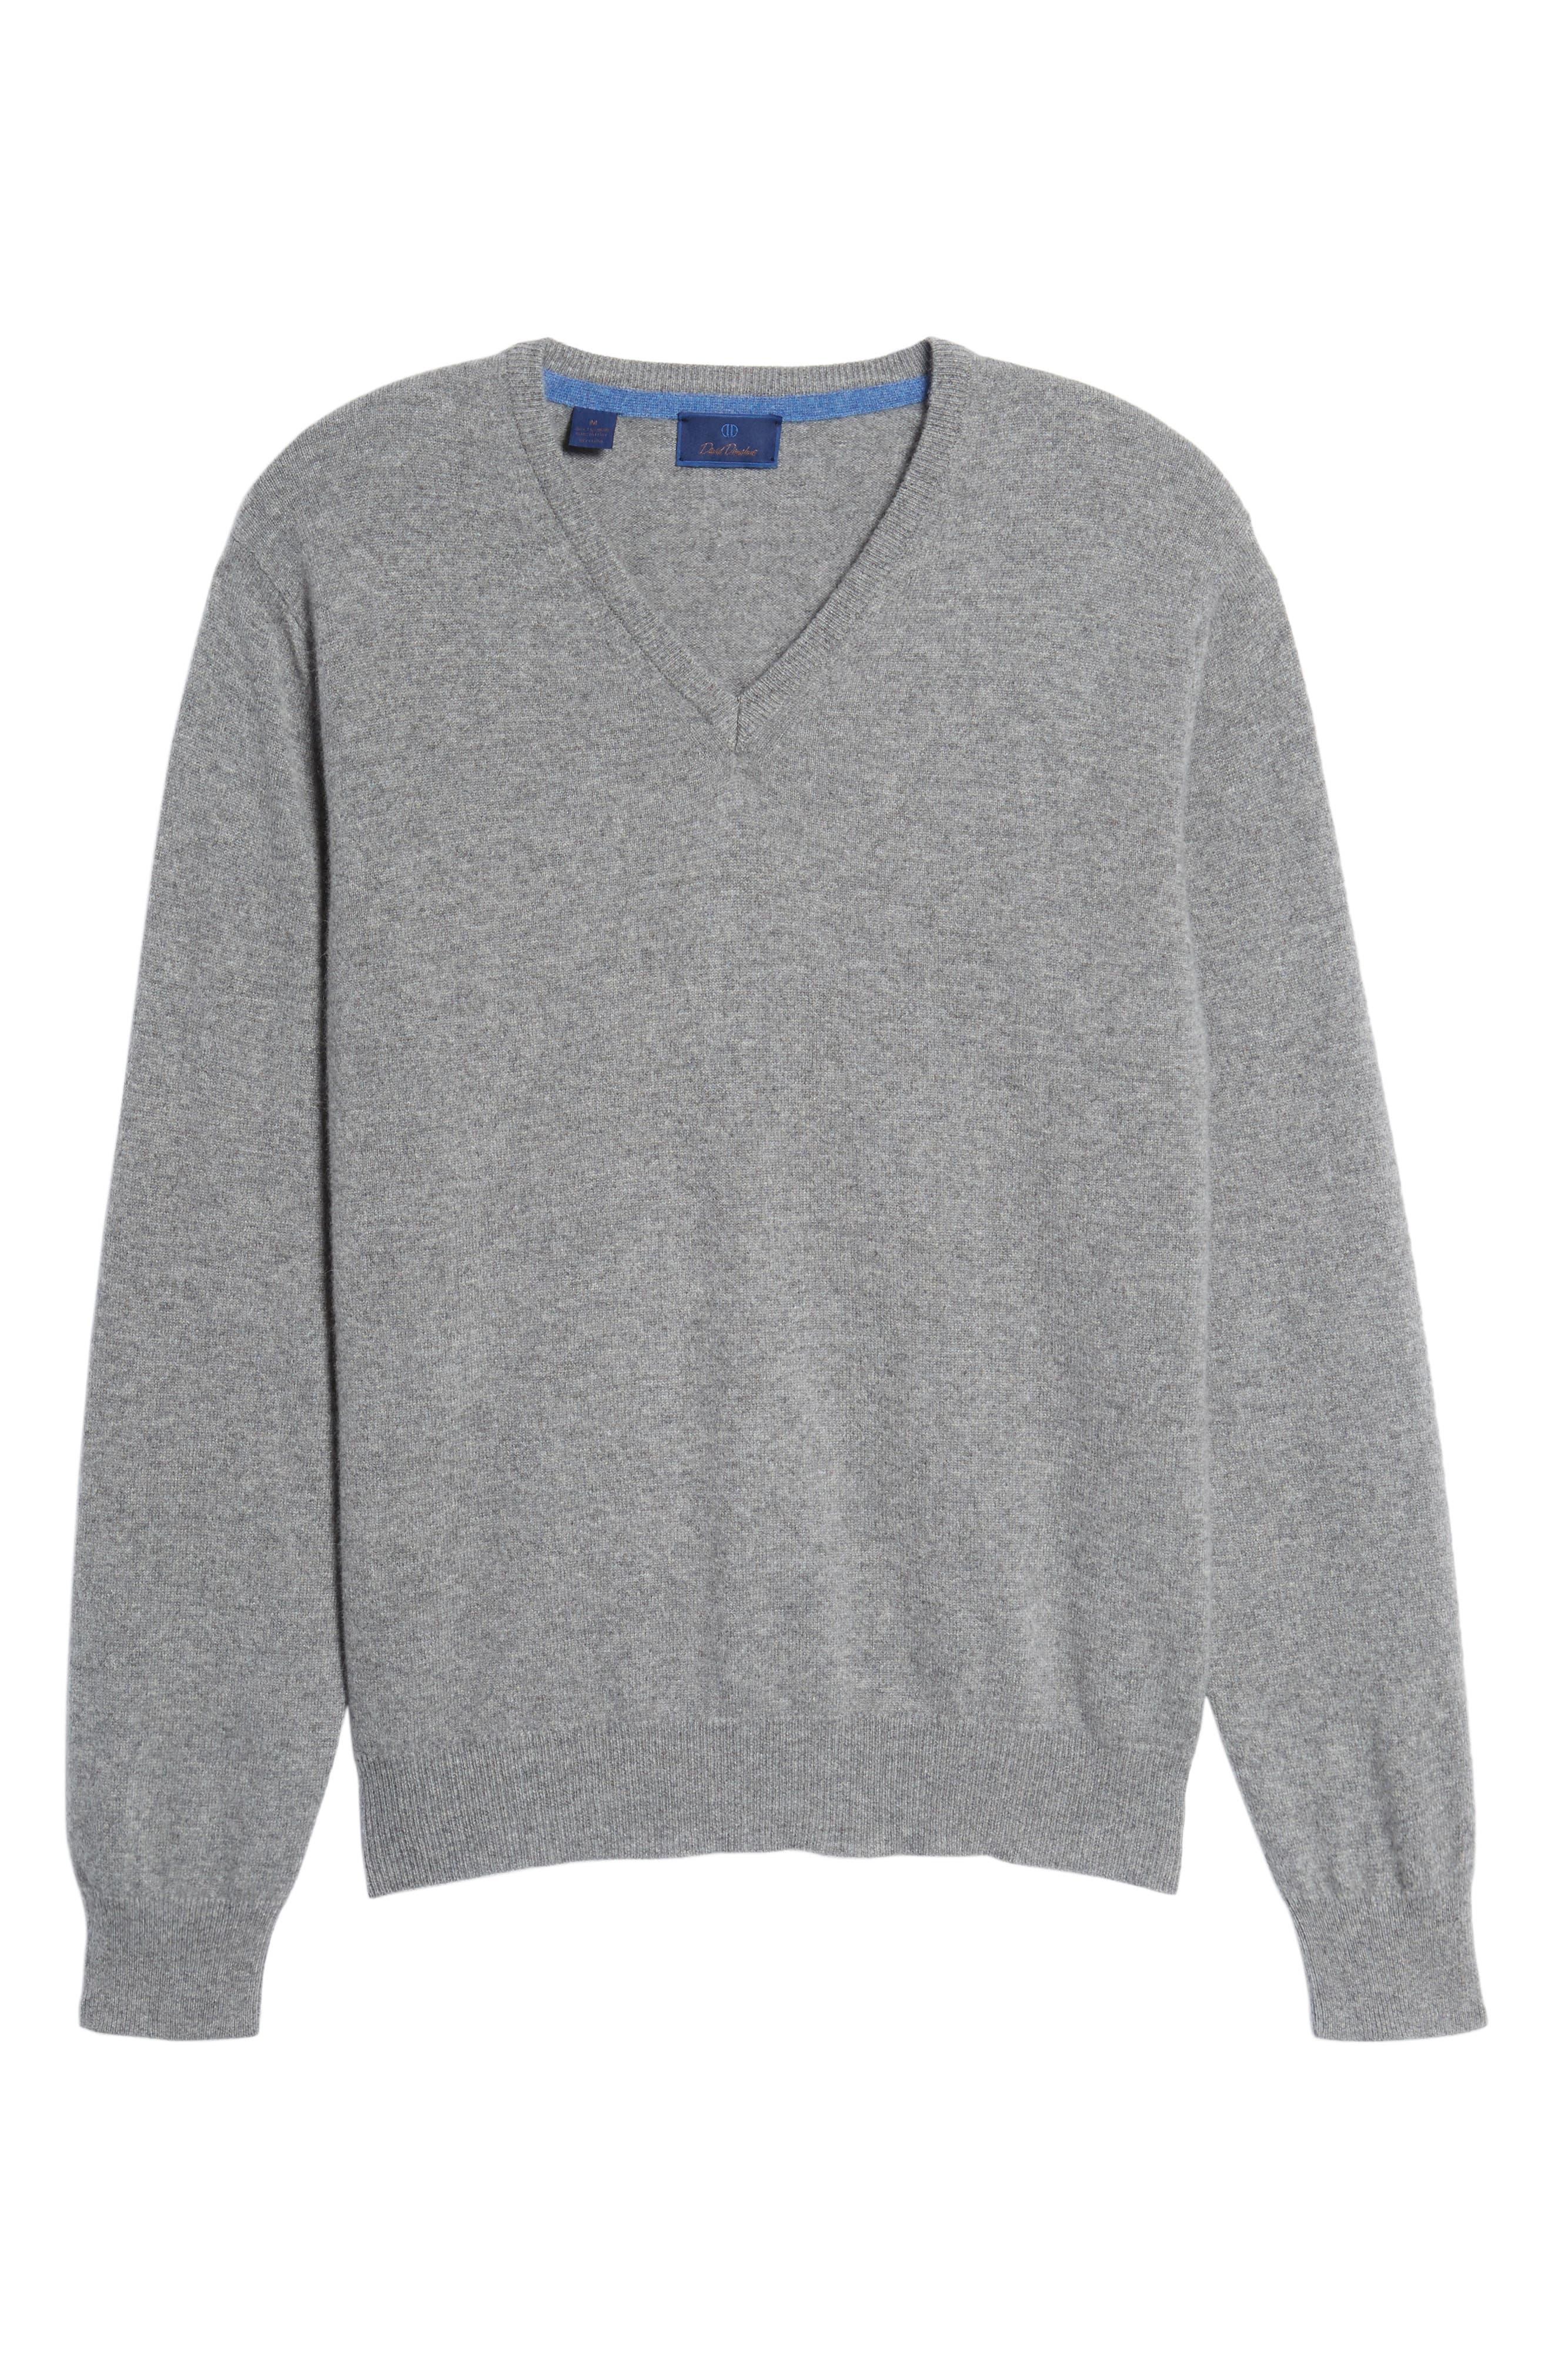 Cashmere V-Neck Sweater,                             Alternate thumbnail 32, color,